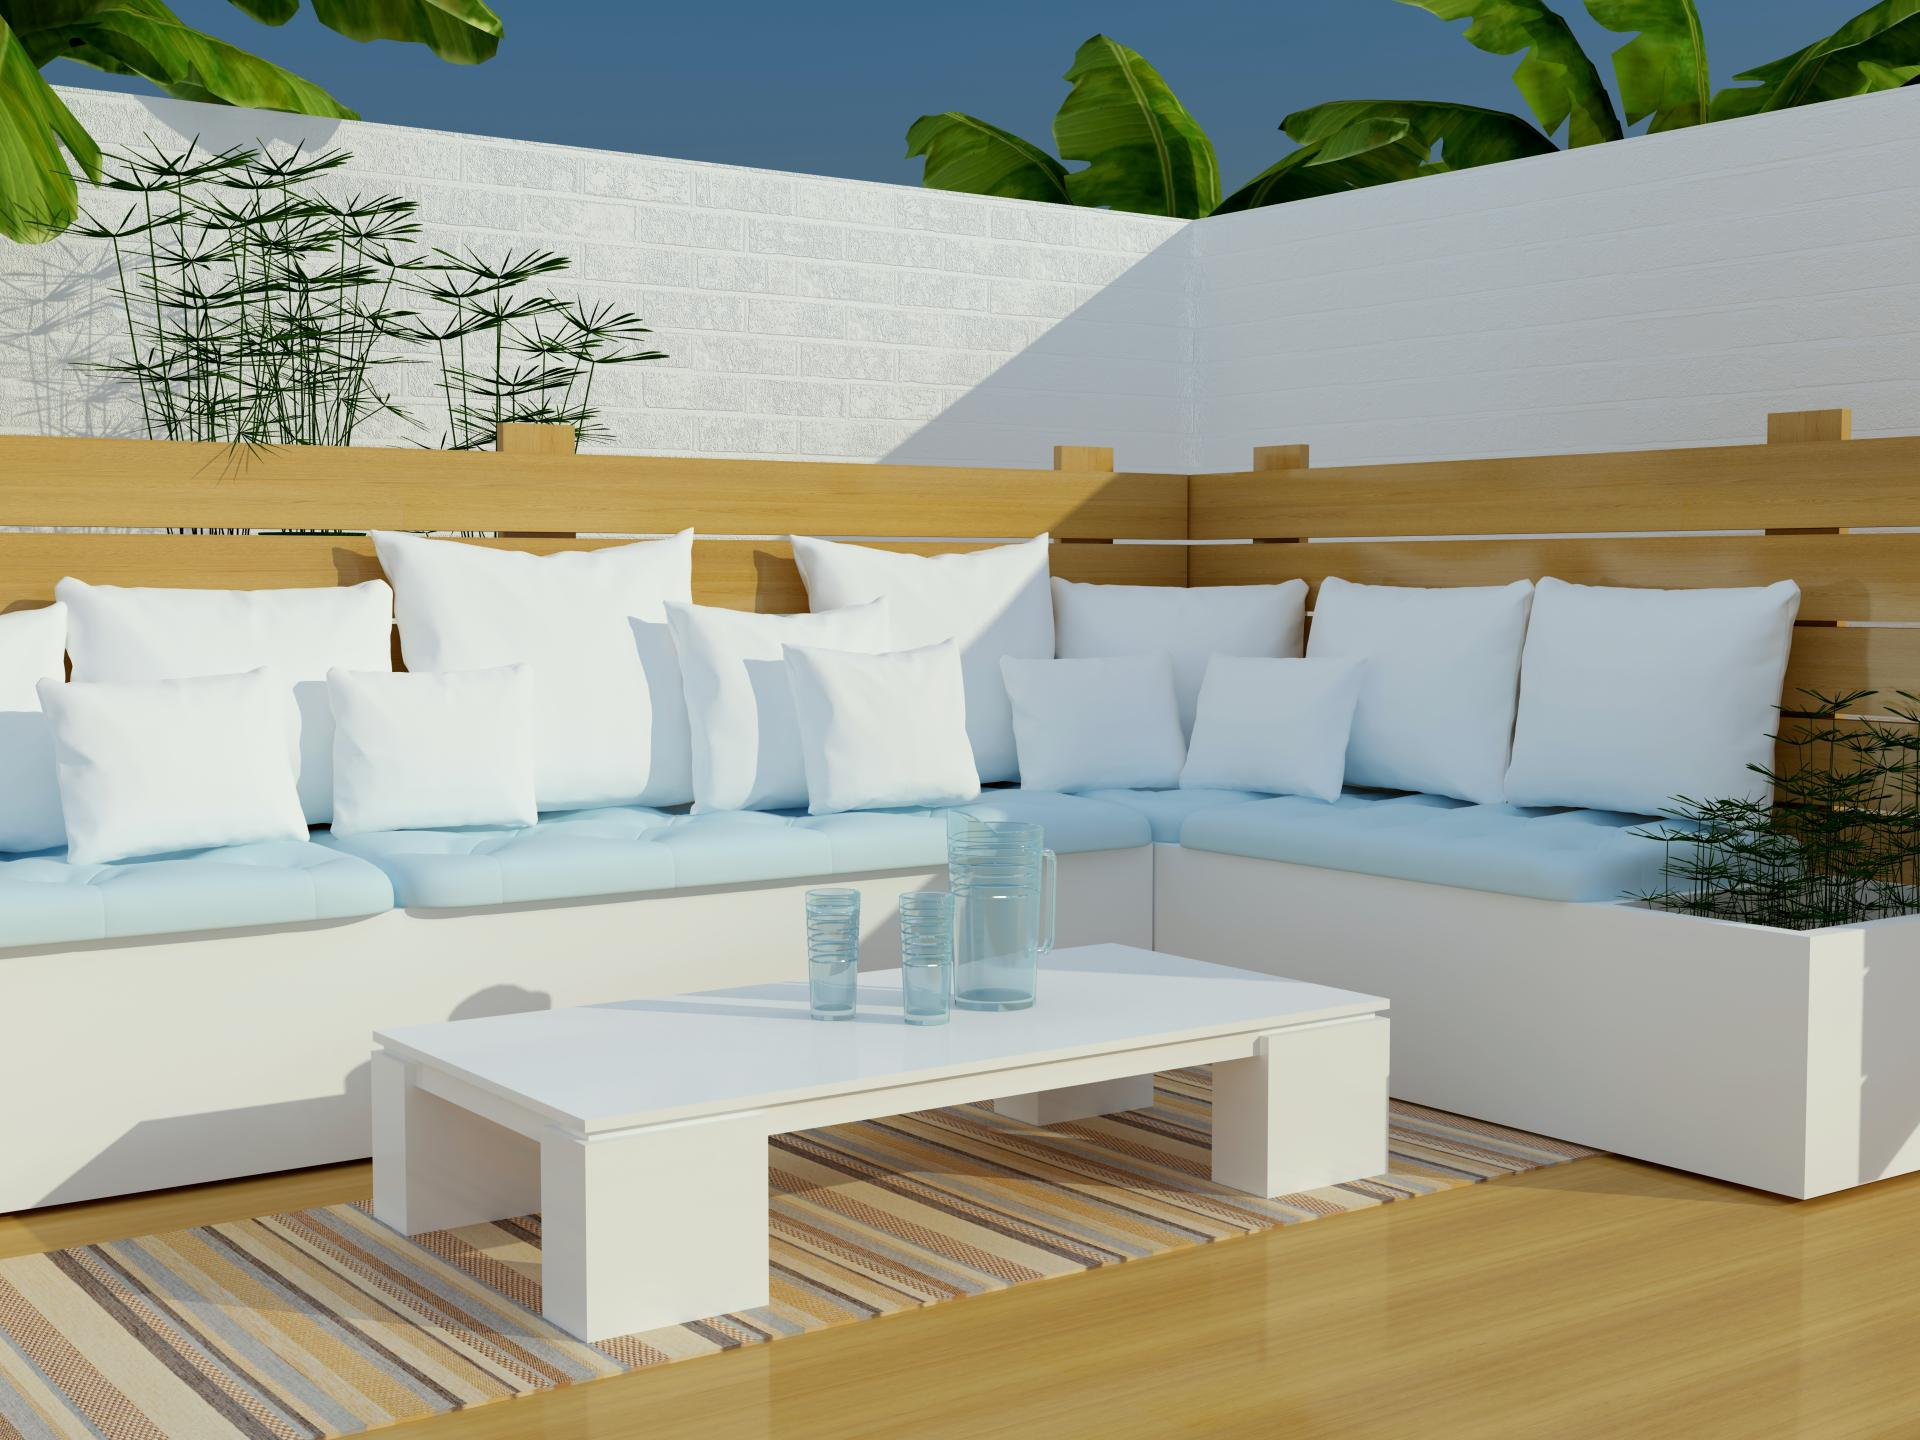 Steigerhouten loungebank maken freds bouwtekeningen review